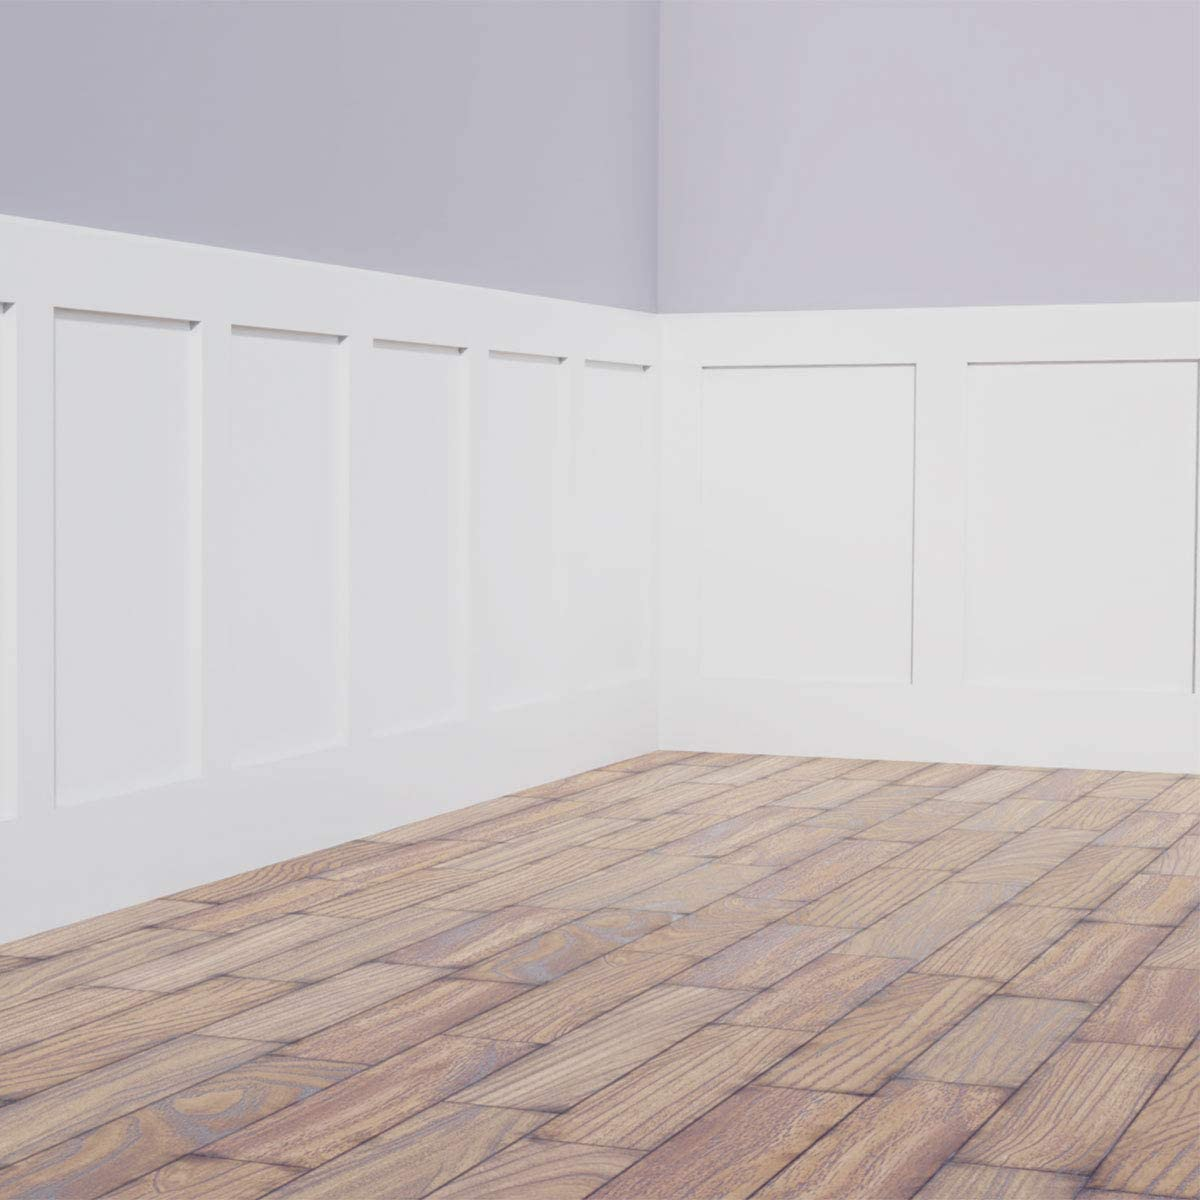 , Ekena Millwork PML03X03ER-CASE-12 3 8 inch W x 3 8 inch H x 7//8 inch P Eris Key Panel Moulding Corner 12-Pack